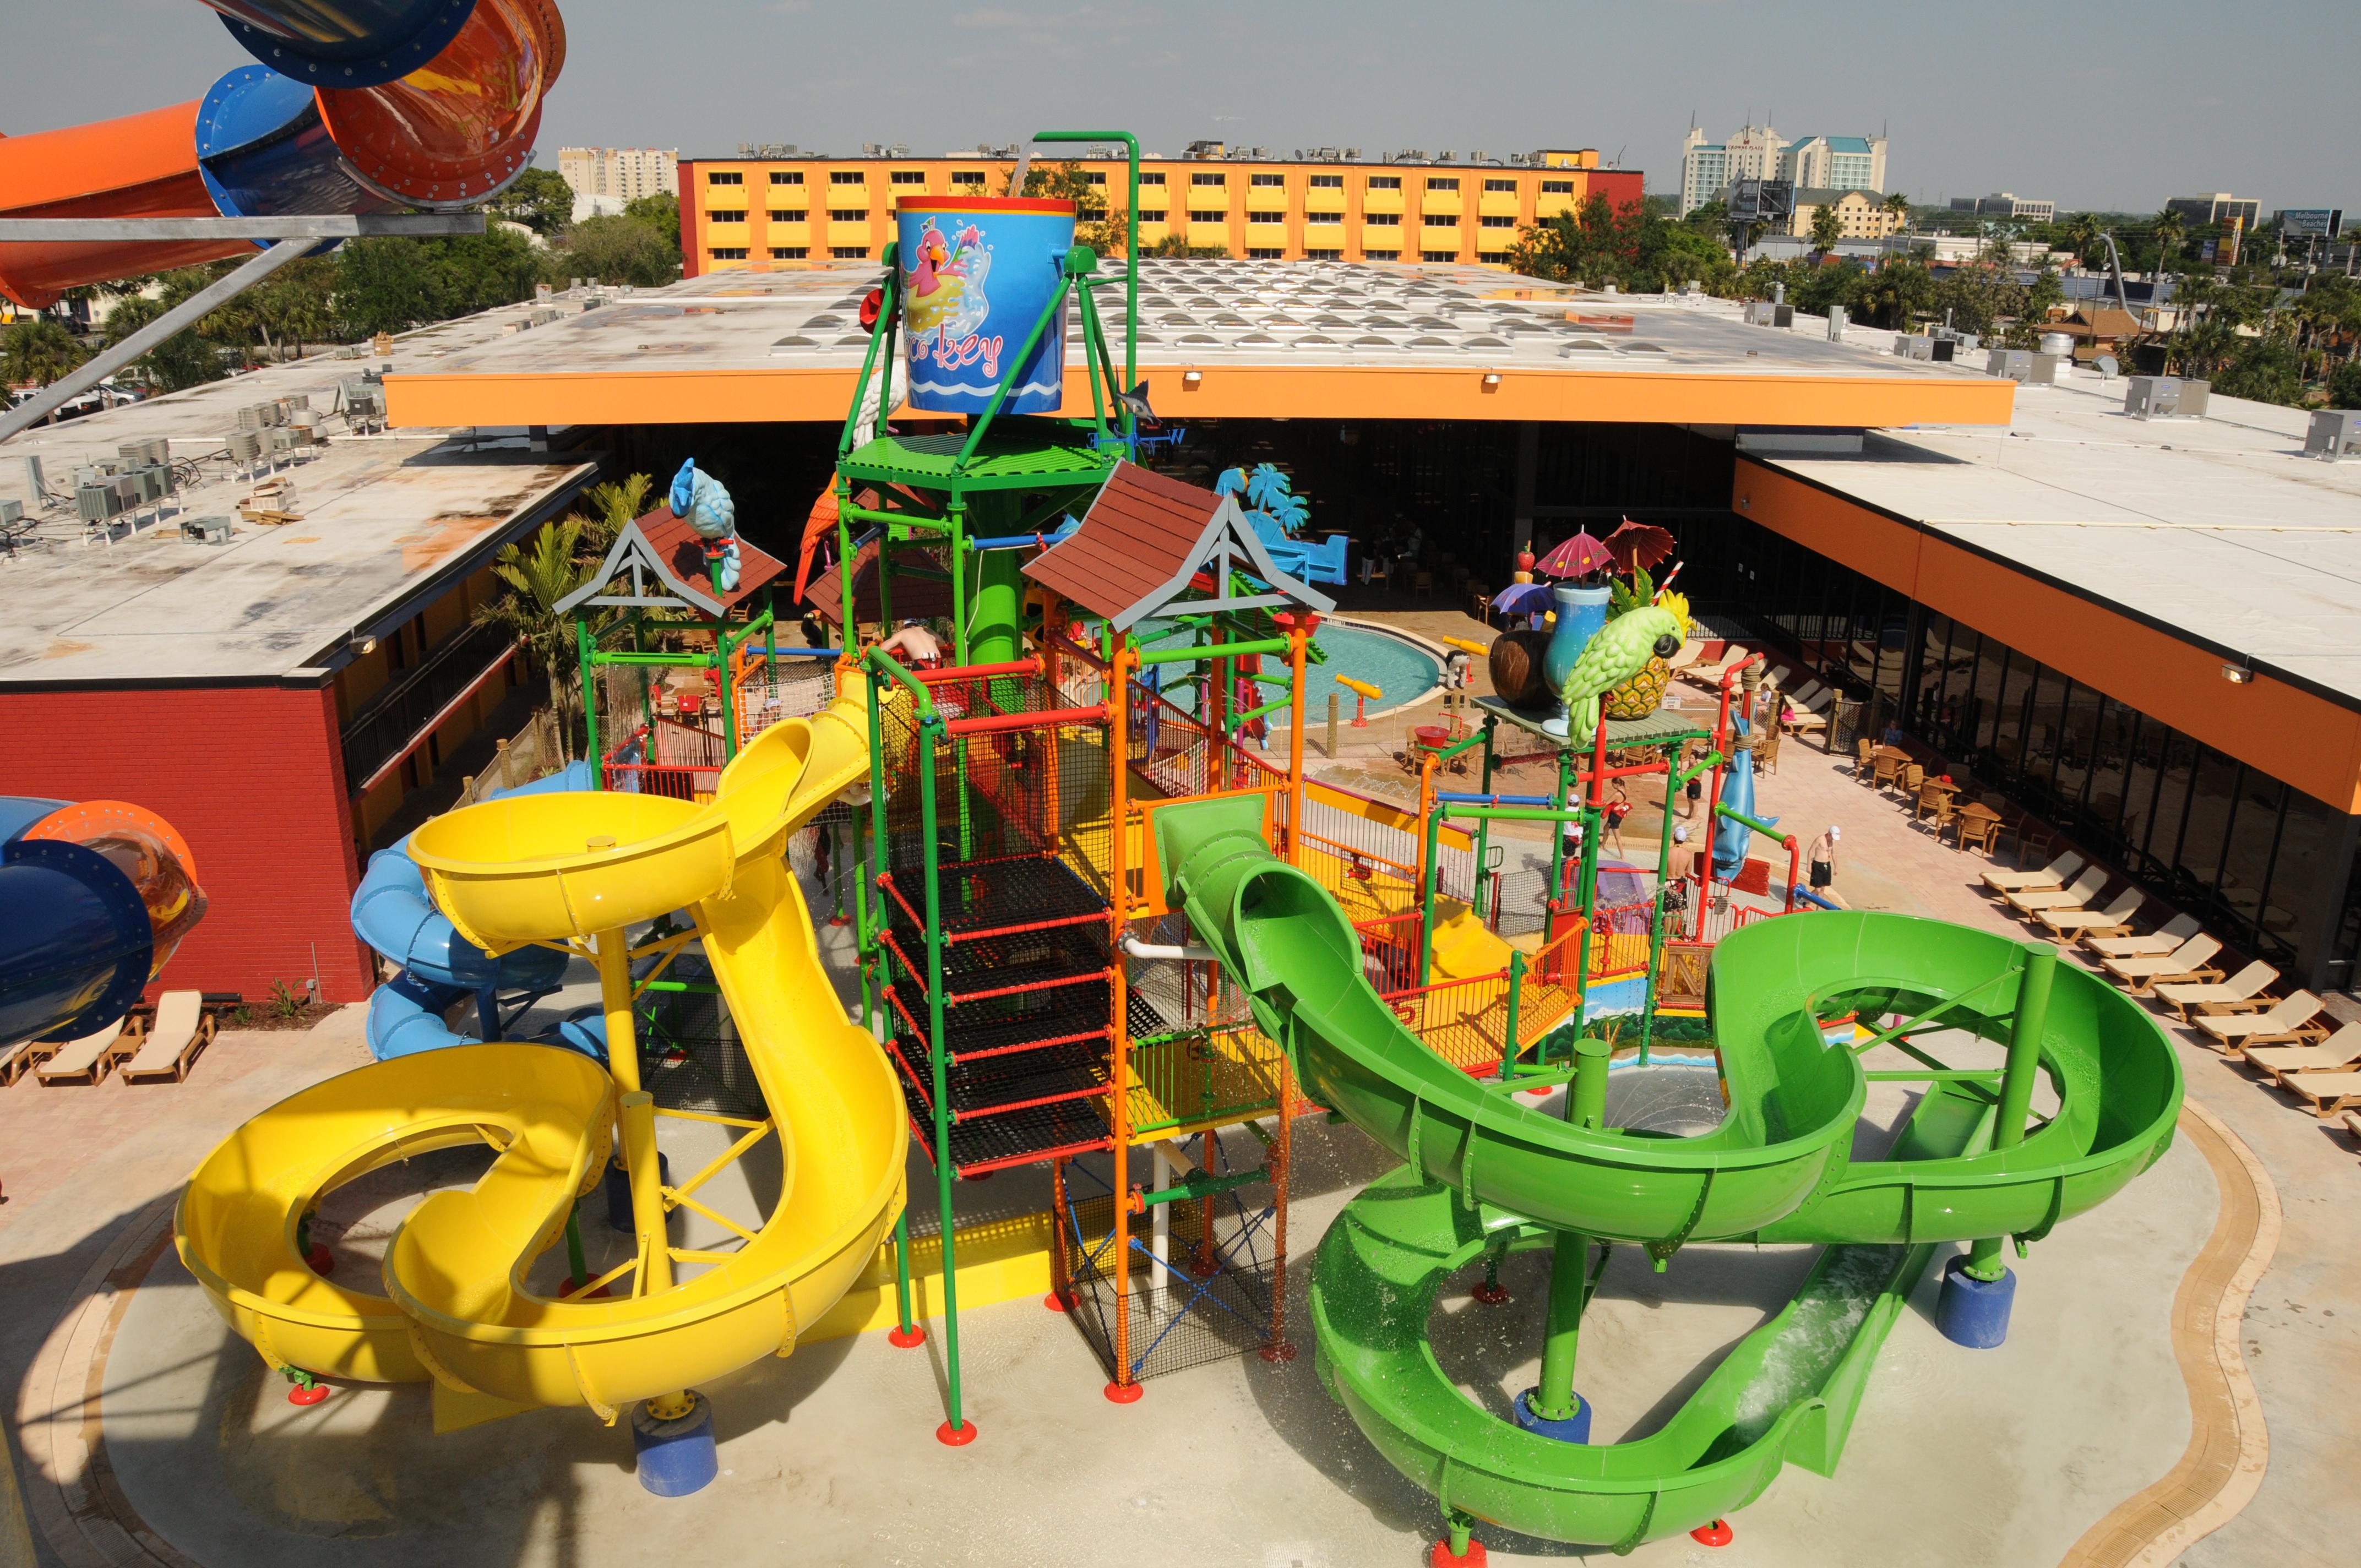 CoCo Key Hotel  Water Park is a FamilyFriendly Getaway